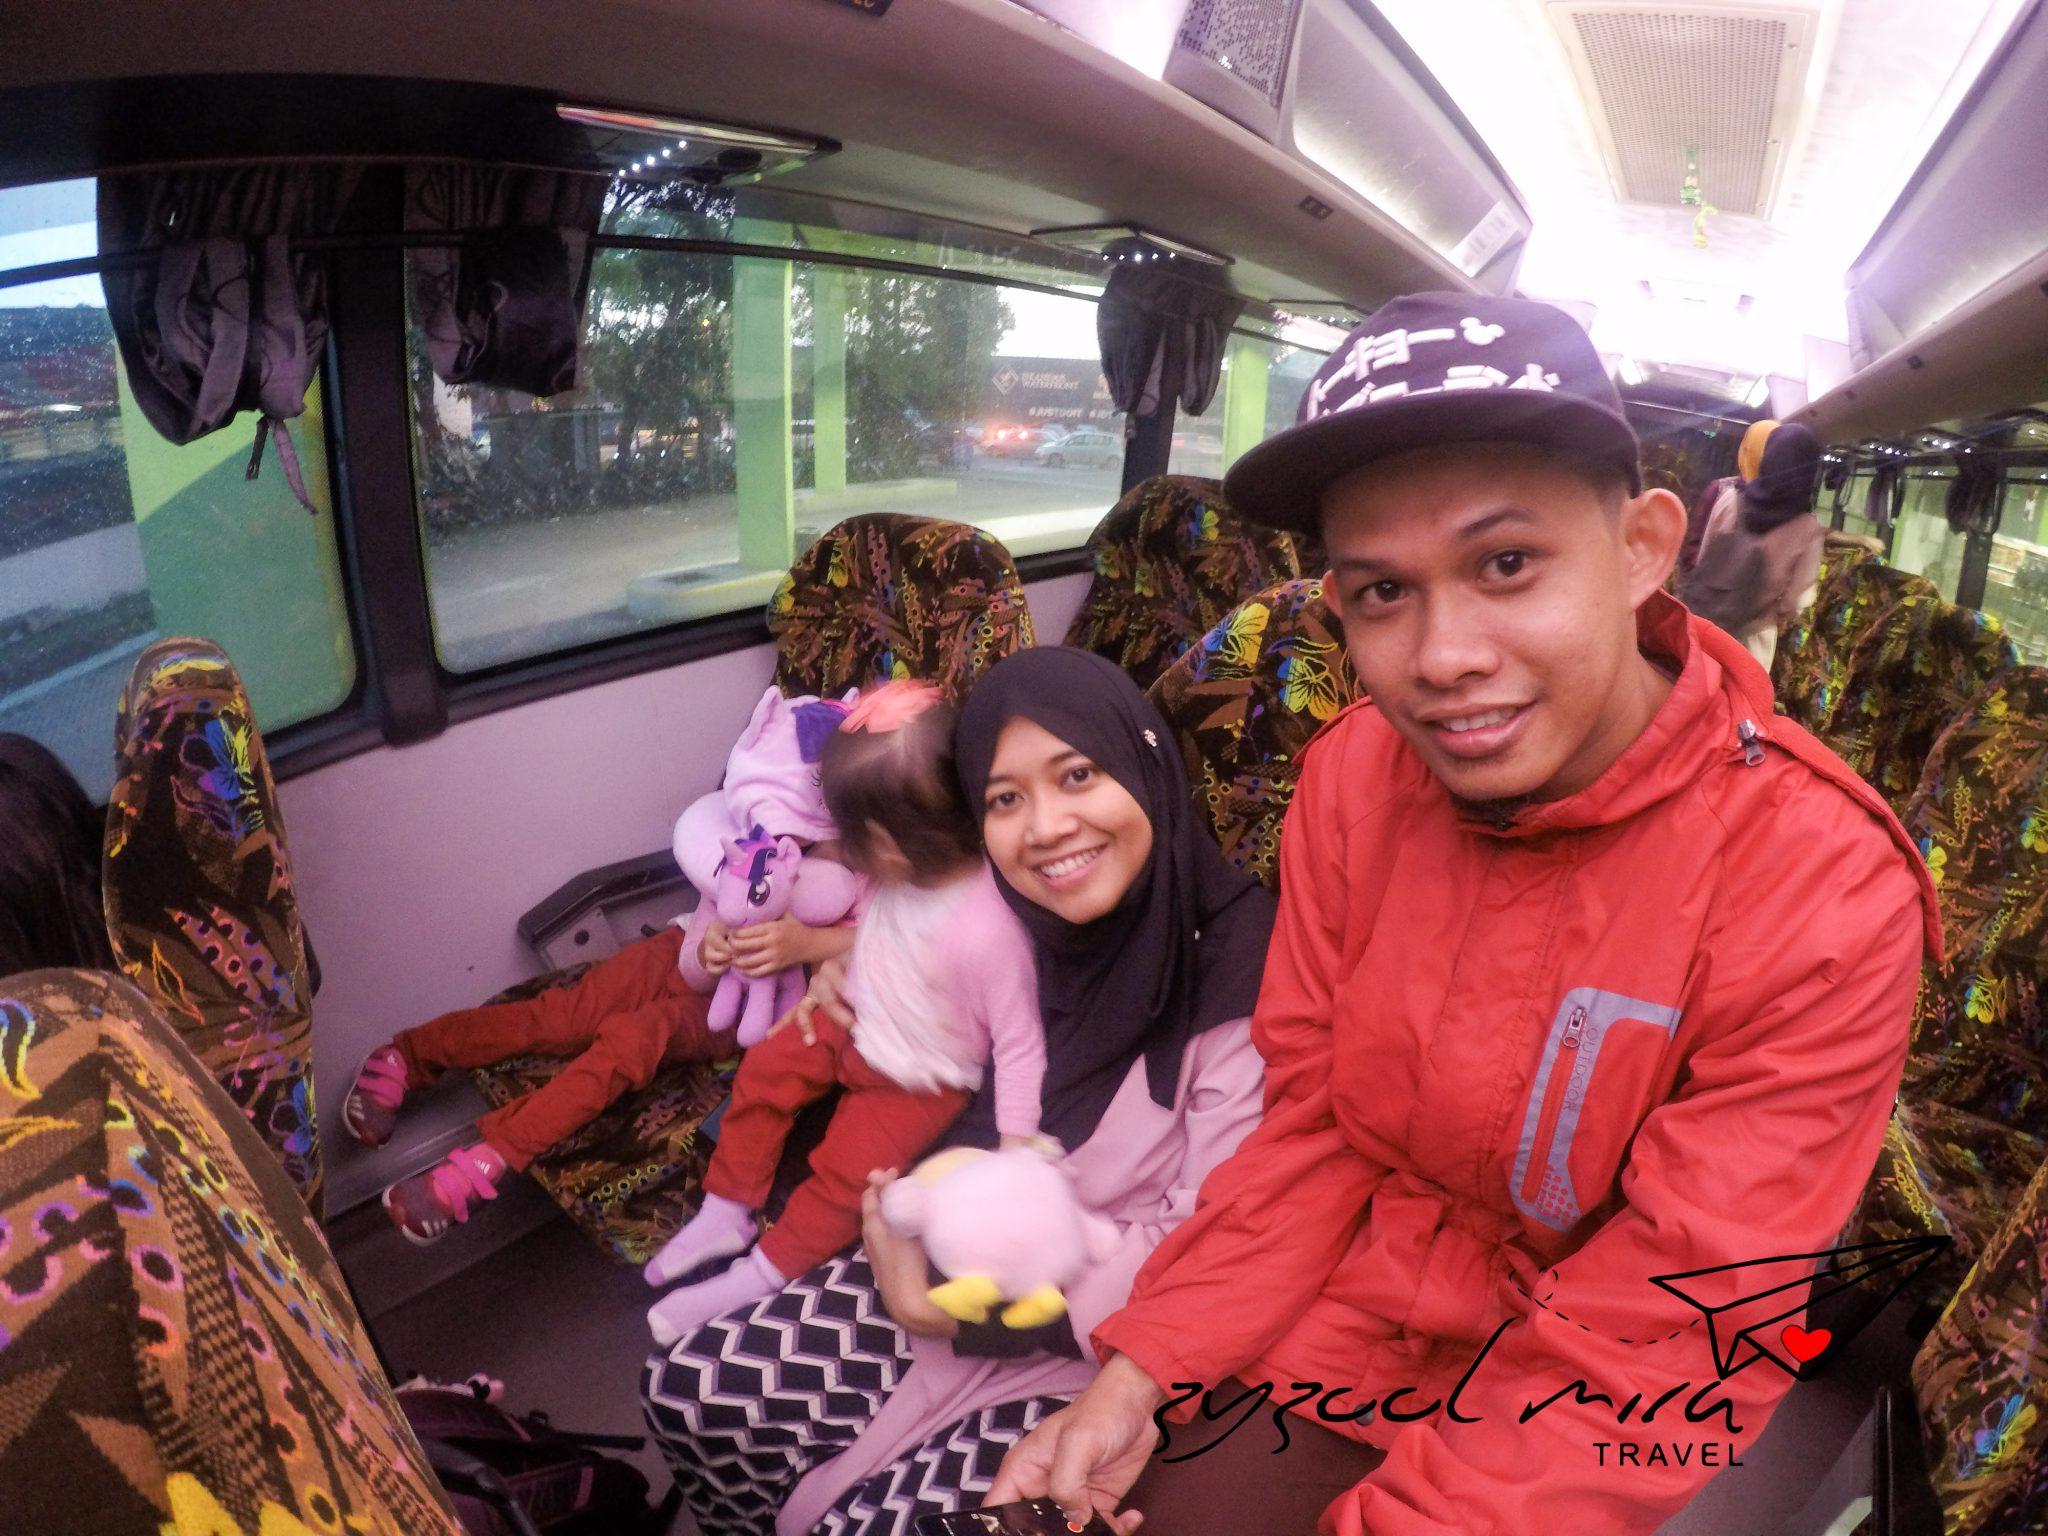 Bas YOYO dari Johor Bahru ke KLIA / KLIA2